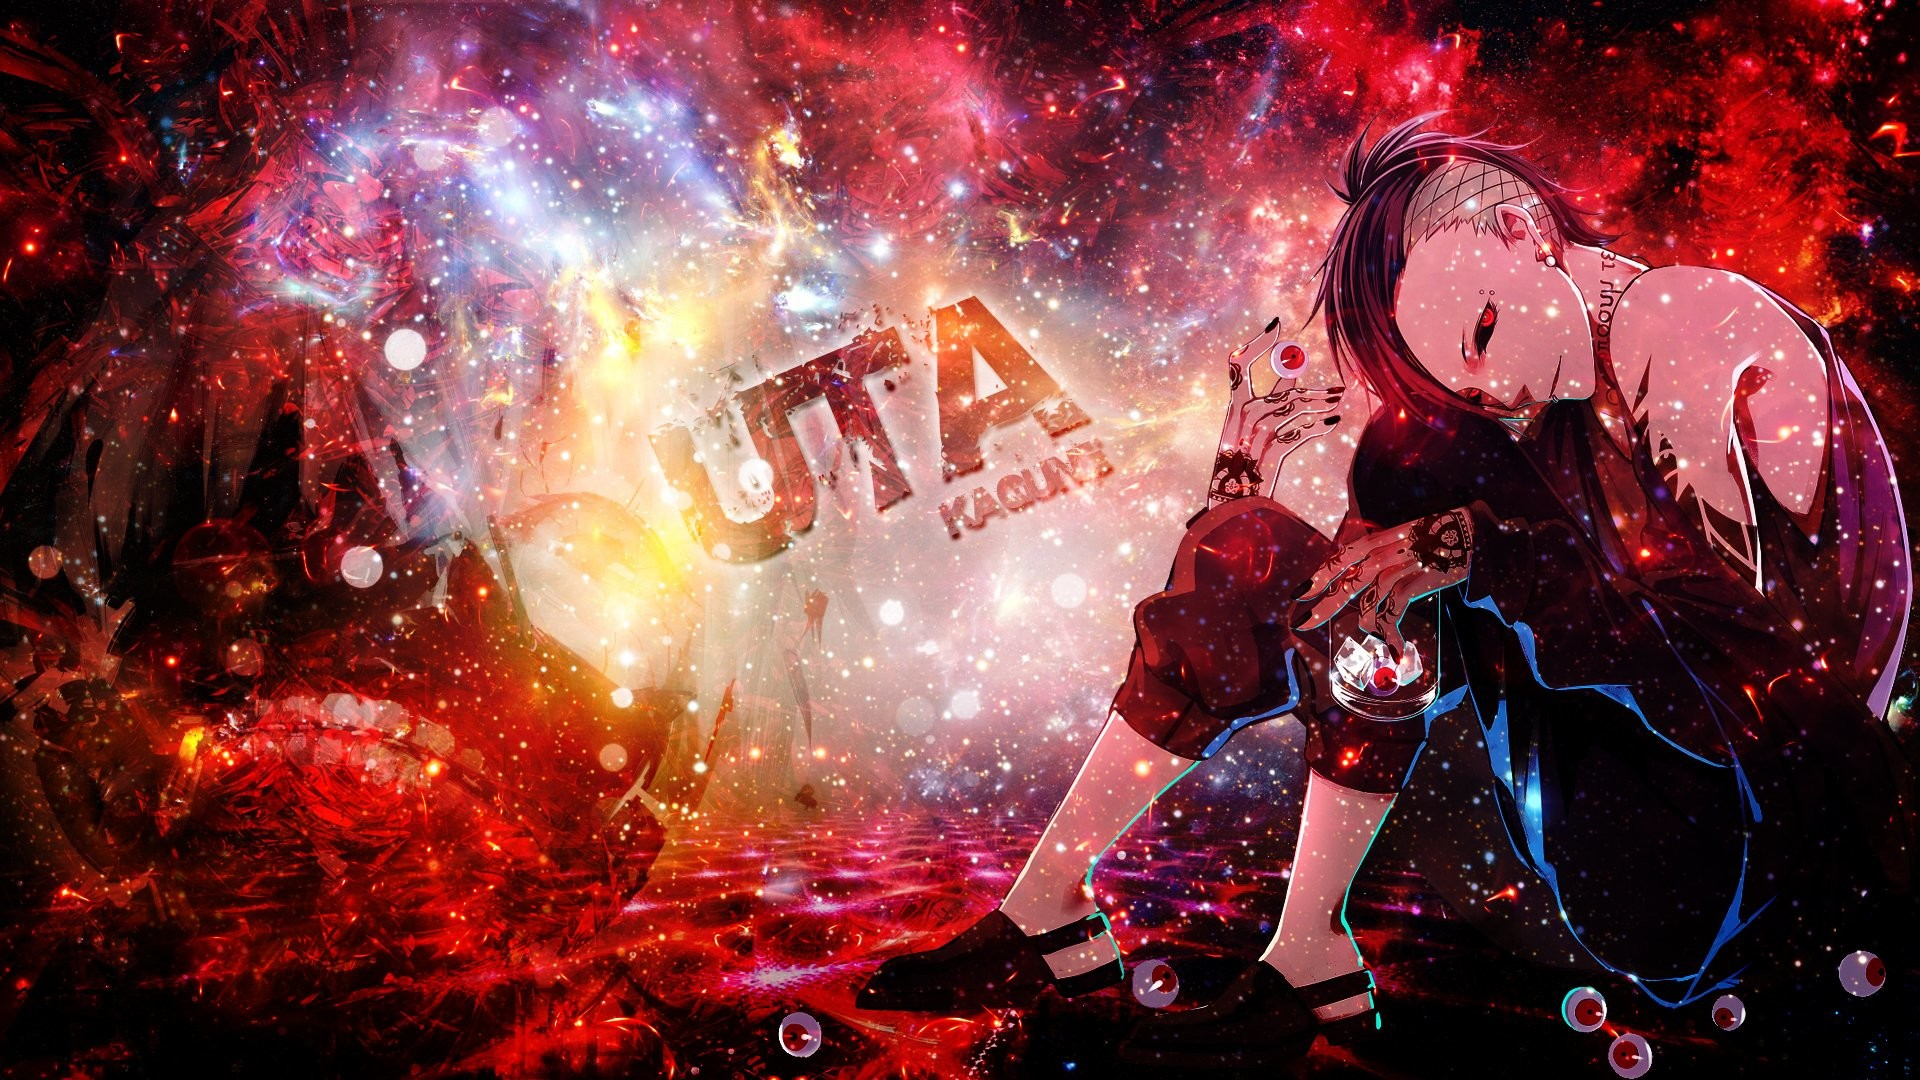 Anime – Tokyo Ghoul Uta (Tokyo Ghoul) Wallpaper